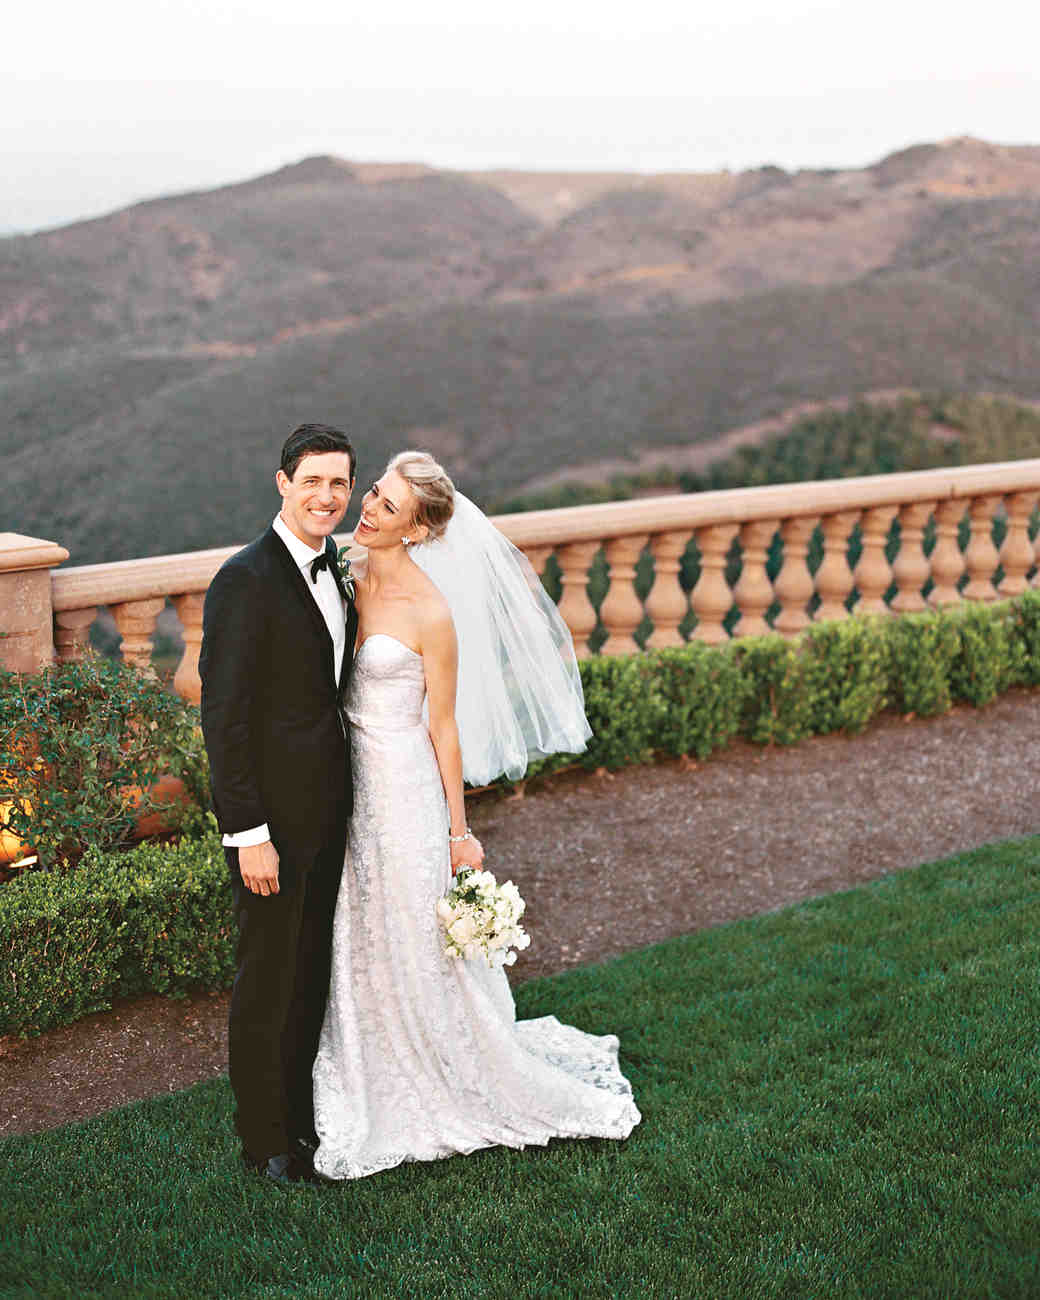 brooke-shea-wedding-476-d111277.jpg